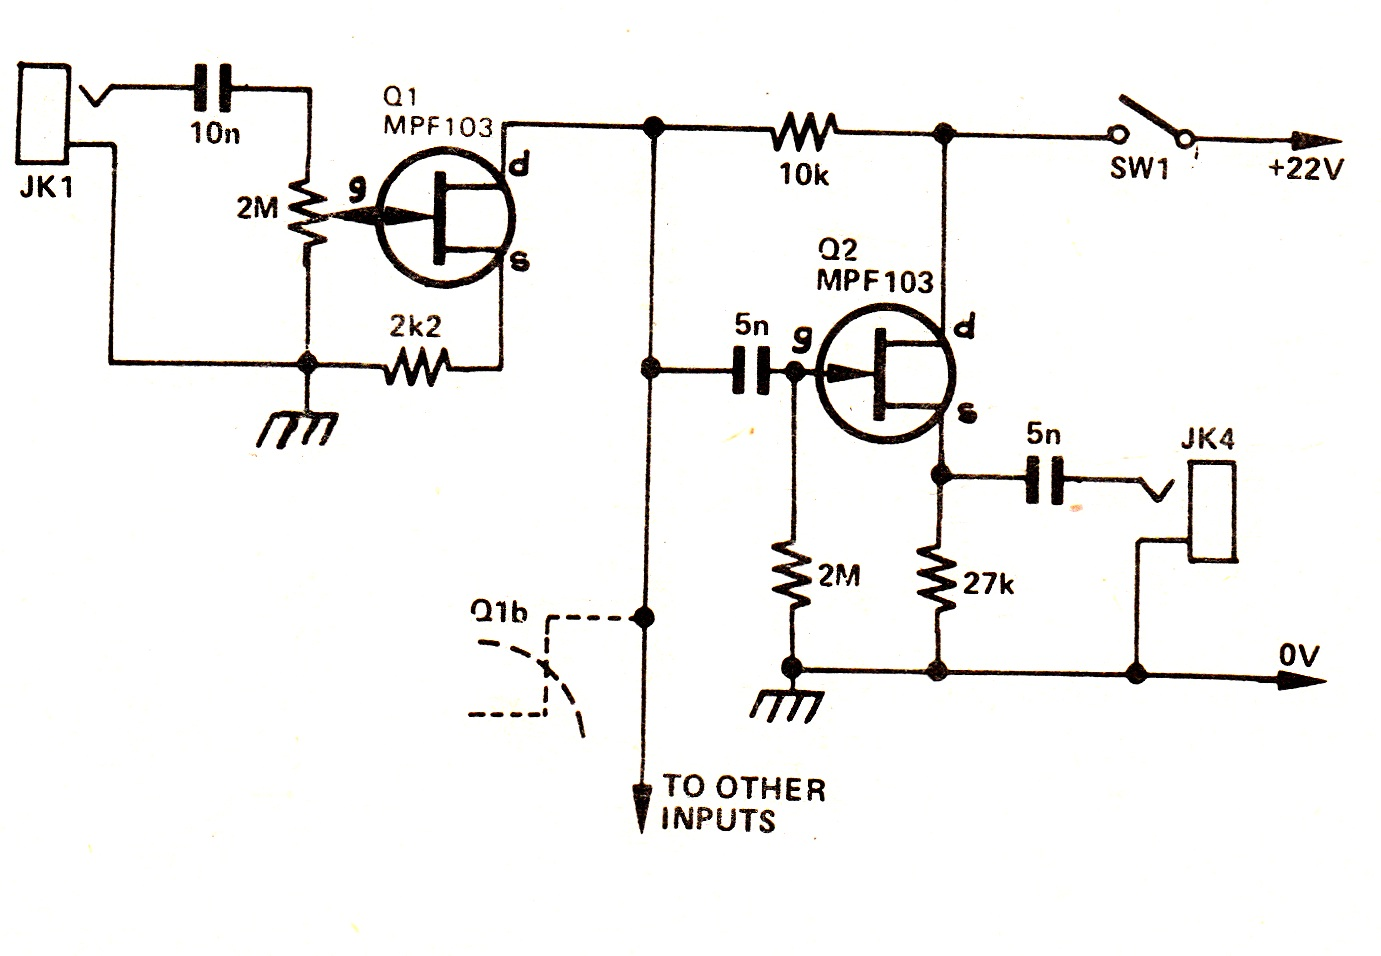 Wiring Diagram Speedometer New Cb150r